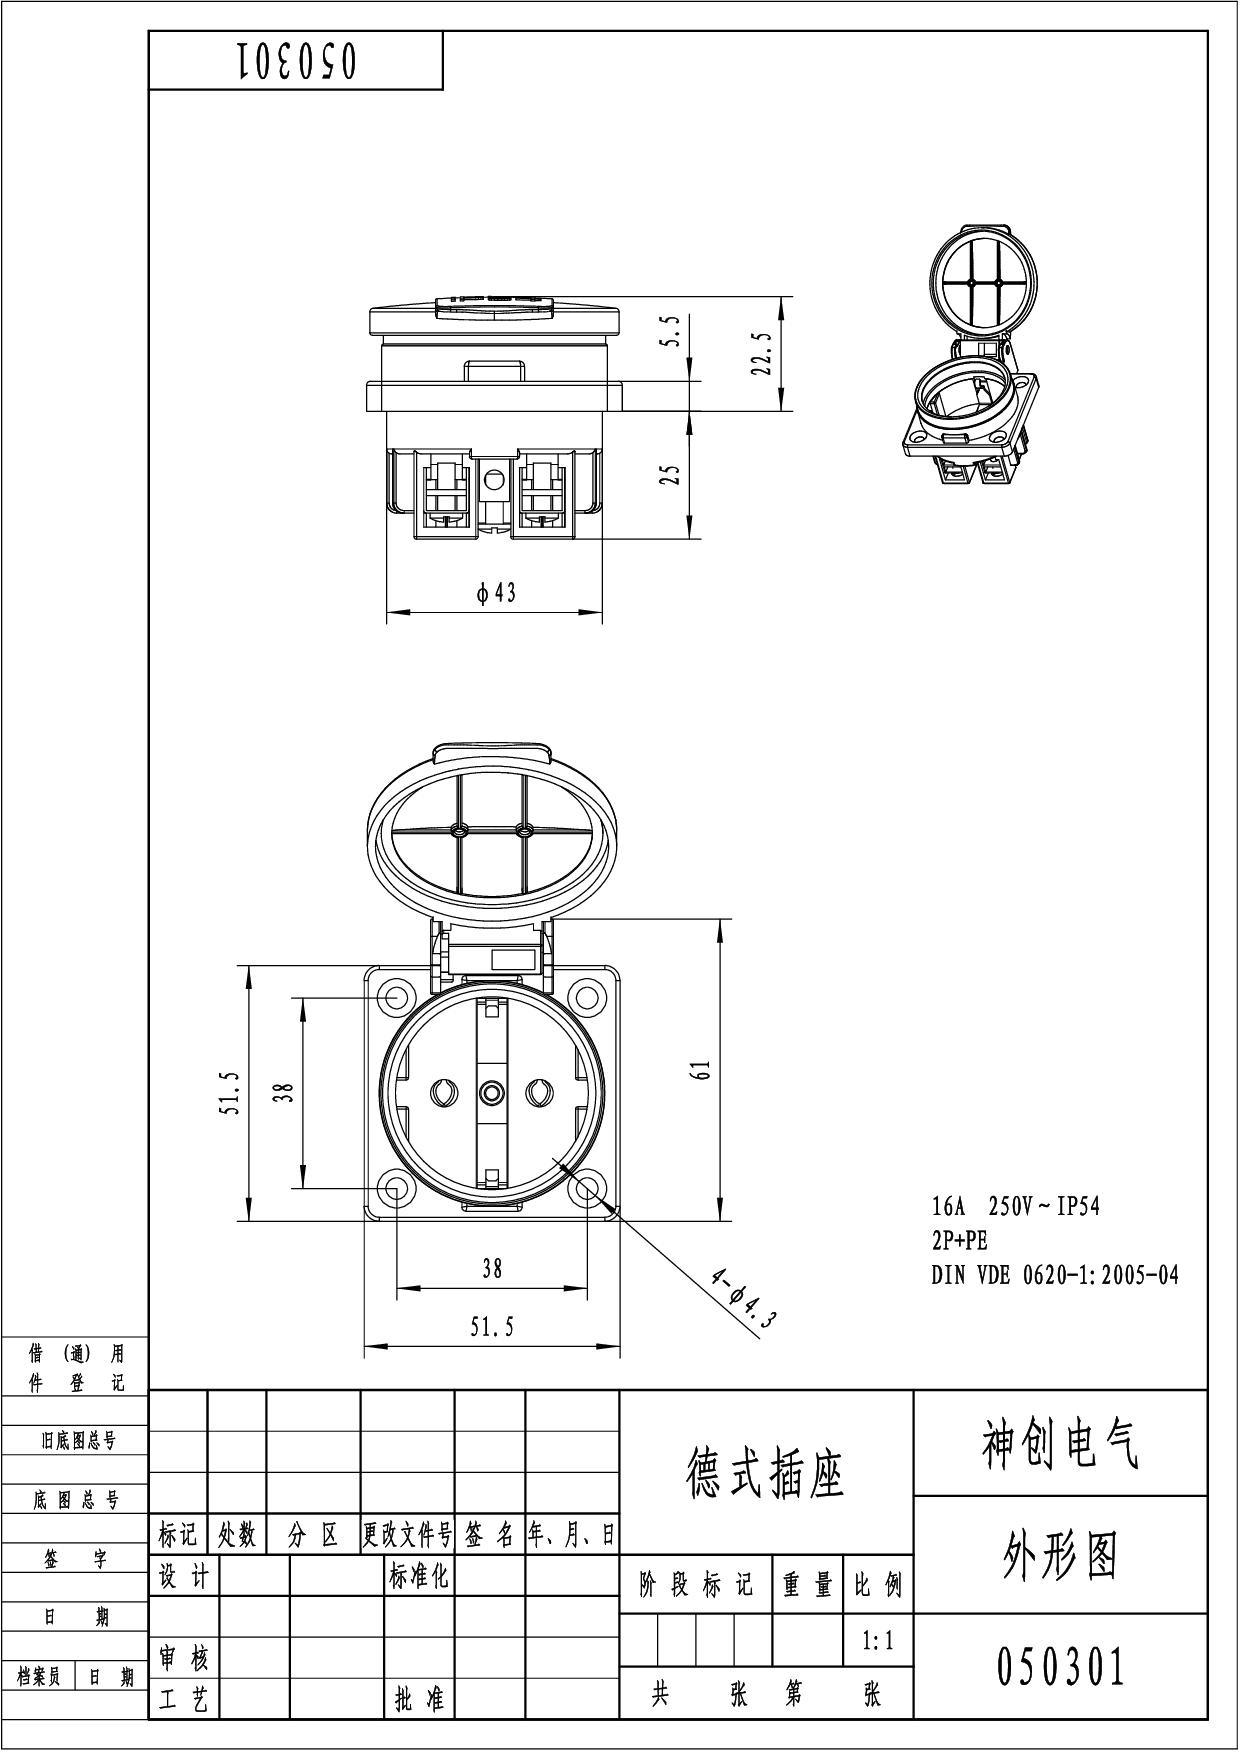 European Outlet Wiring Diagrams Explained Diagram Plug Schuko Socket Electricity Basics 101 U2022 3 Way